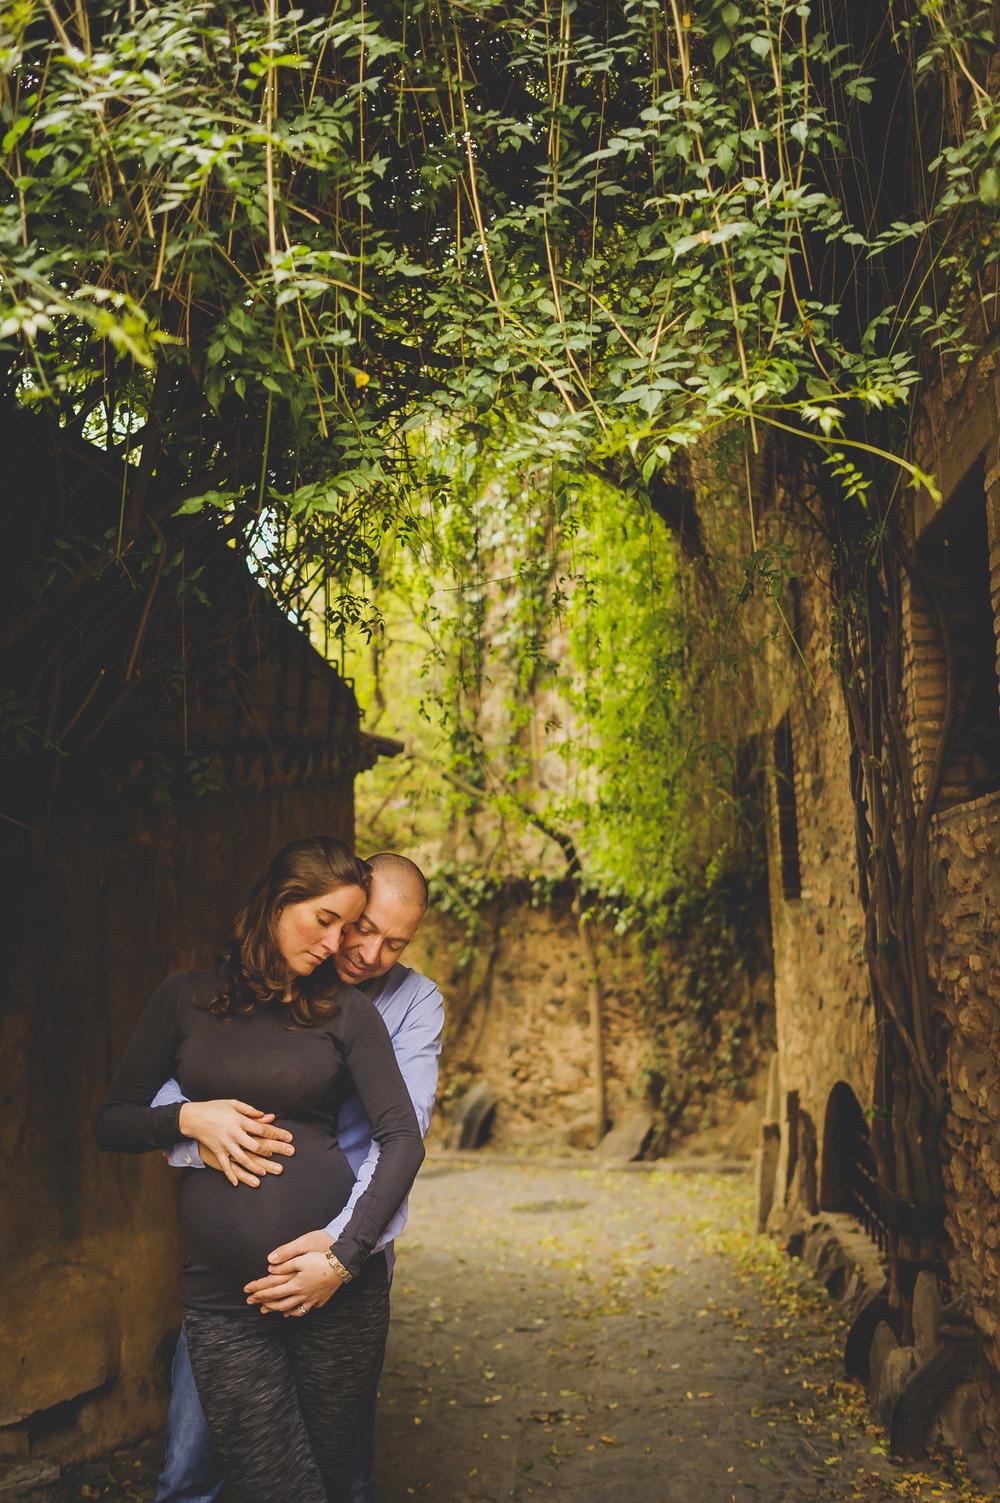 MAT_Sheila&Sergi-1601021121471516.jpg